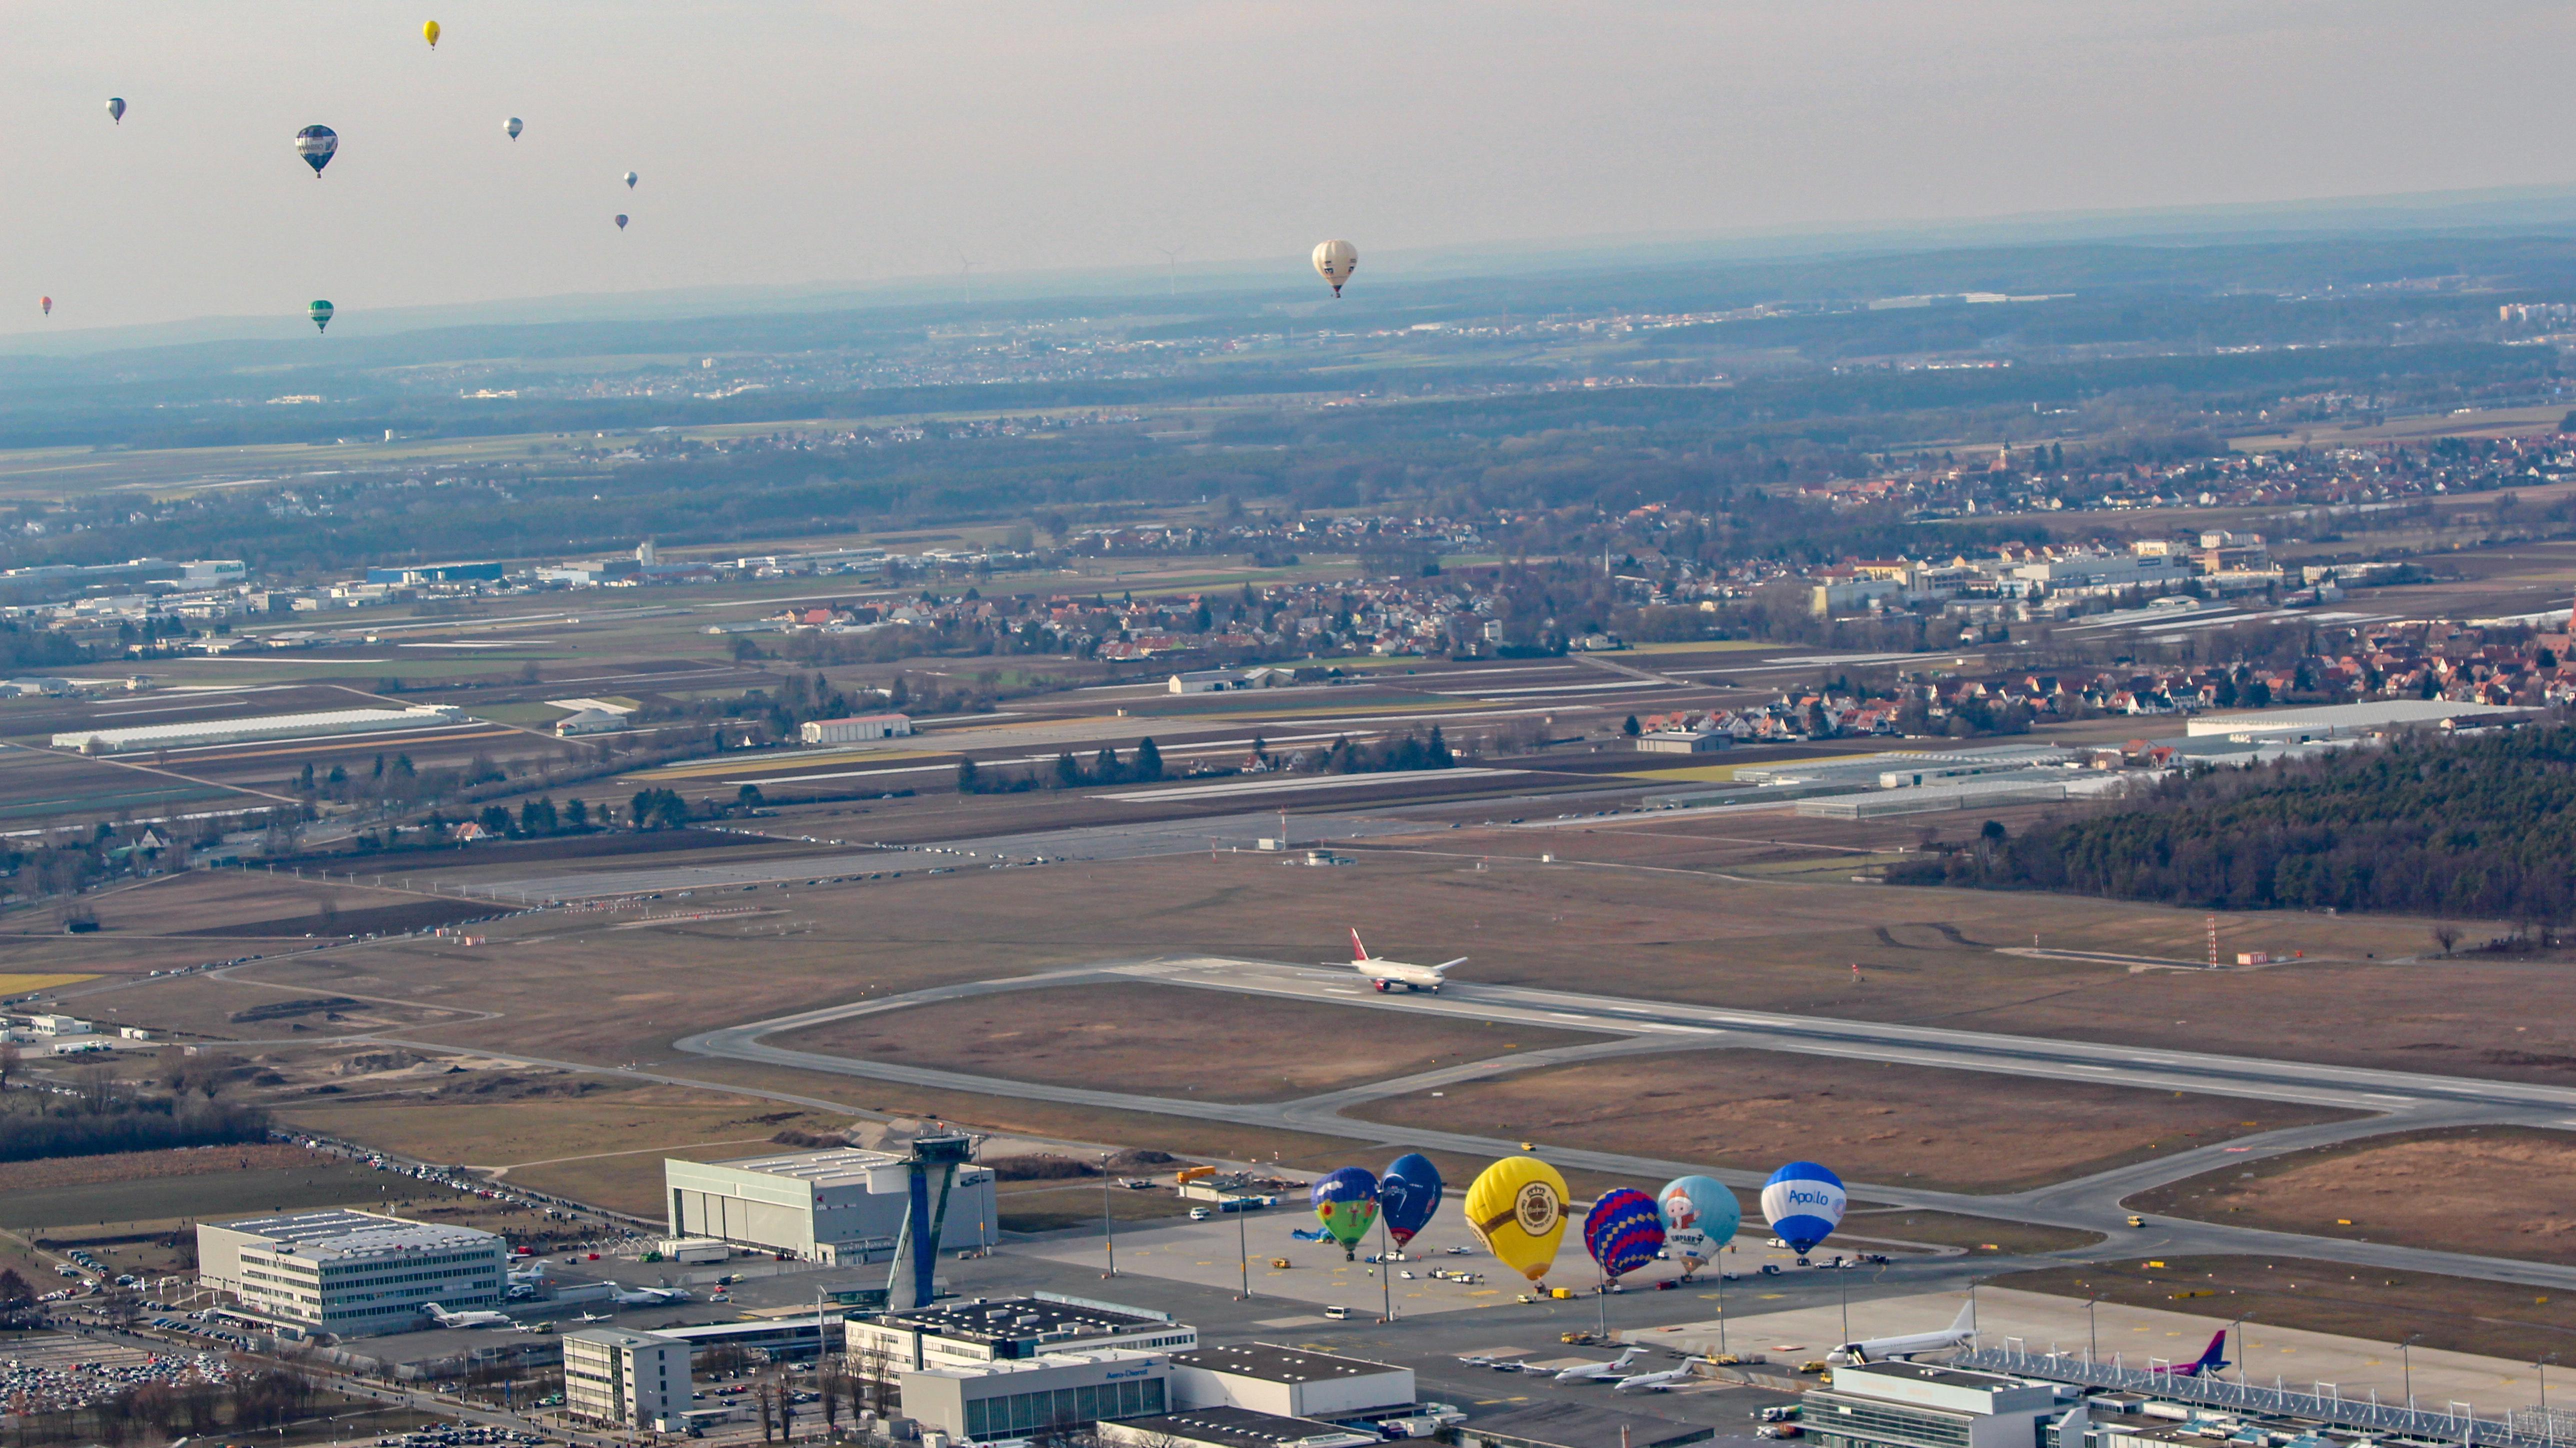 Frankenballoncuß 2019 am Nürnberger Flughafen